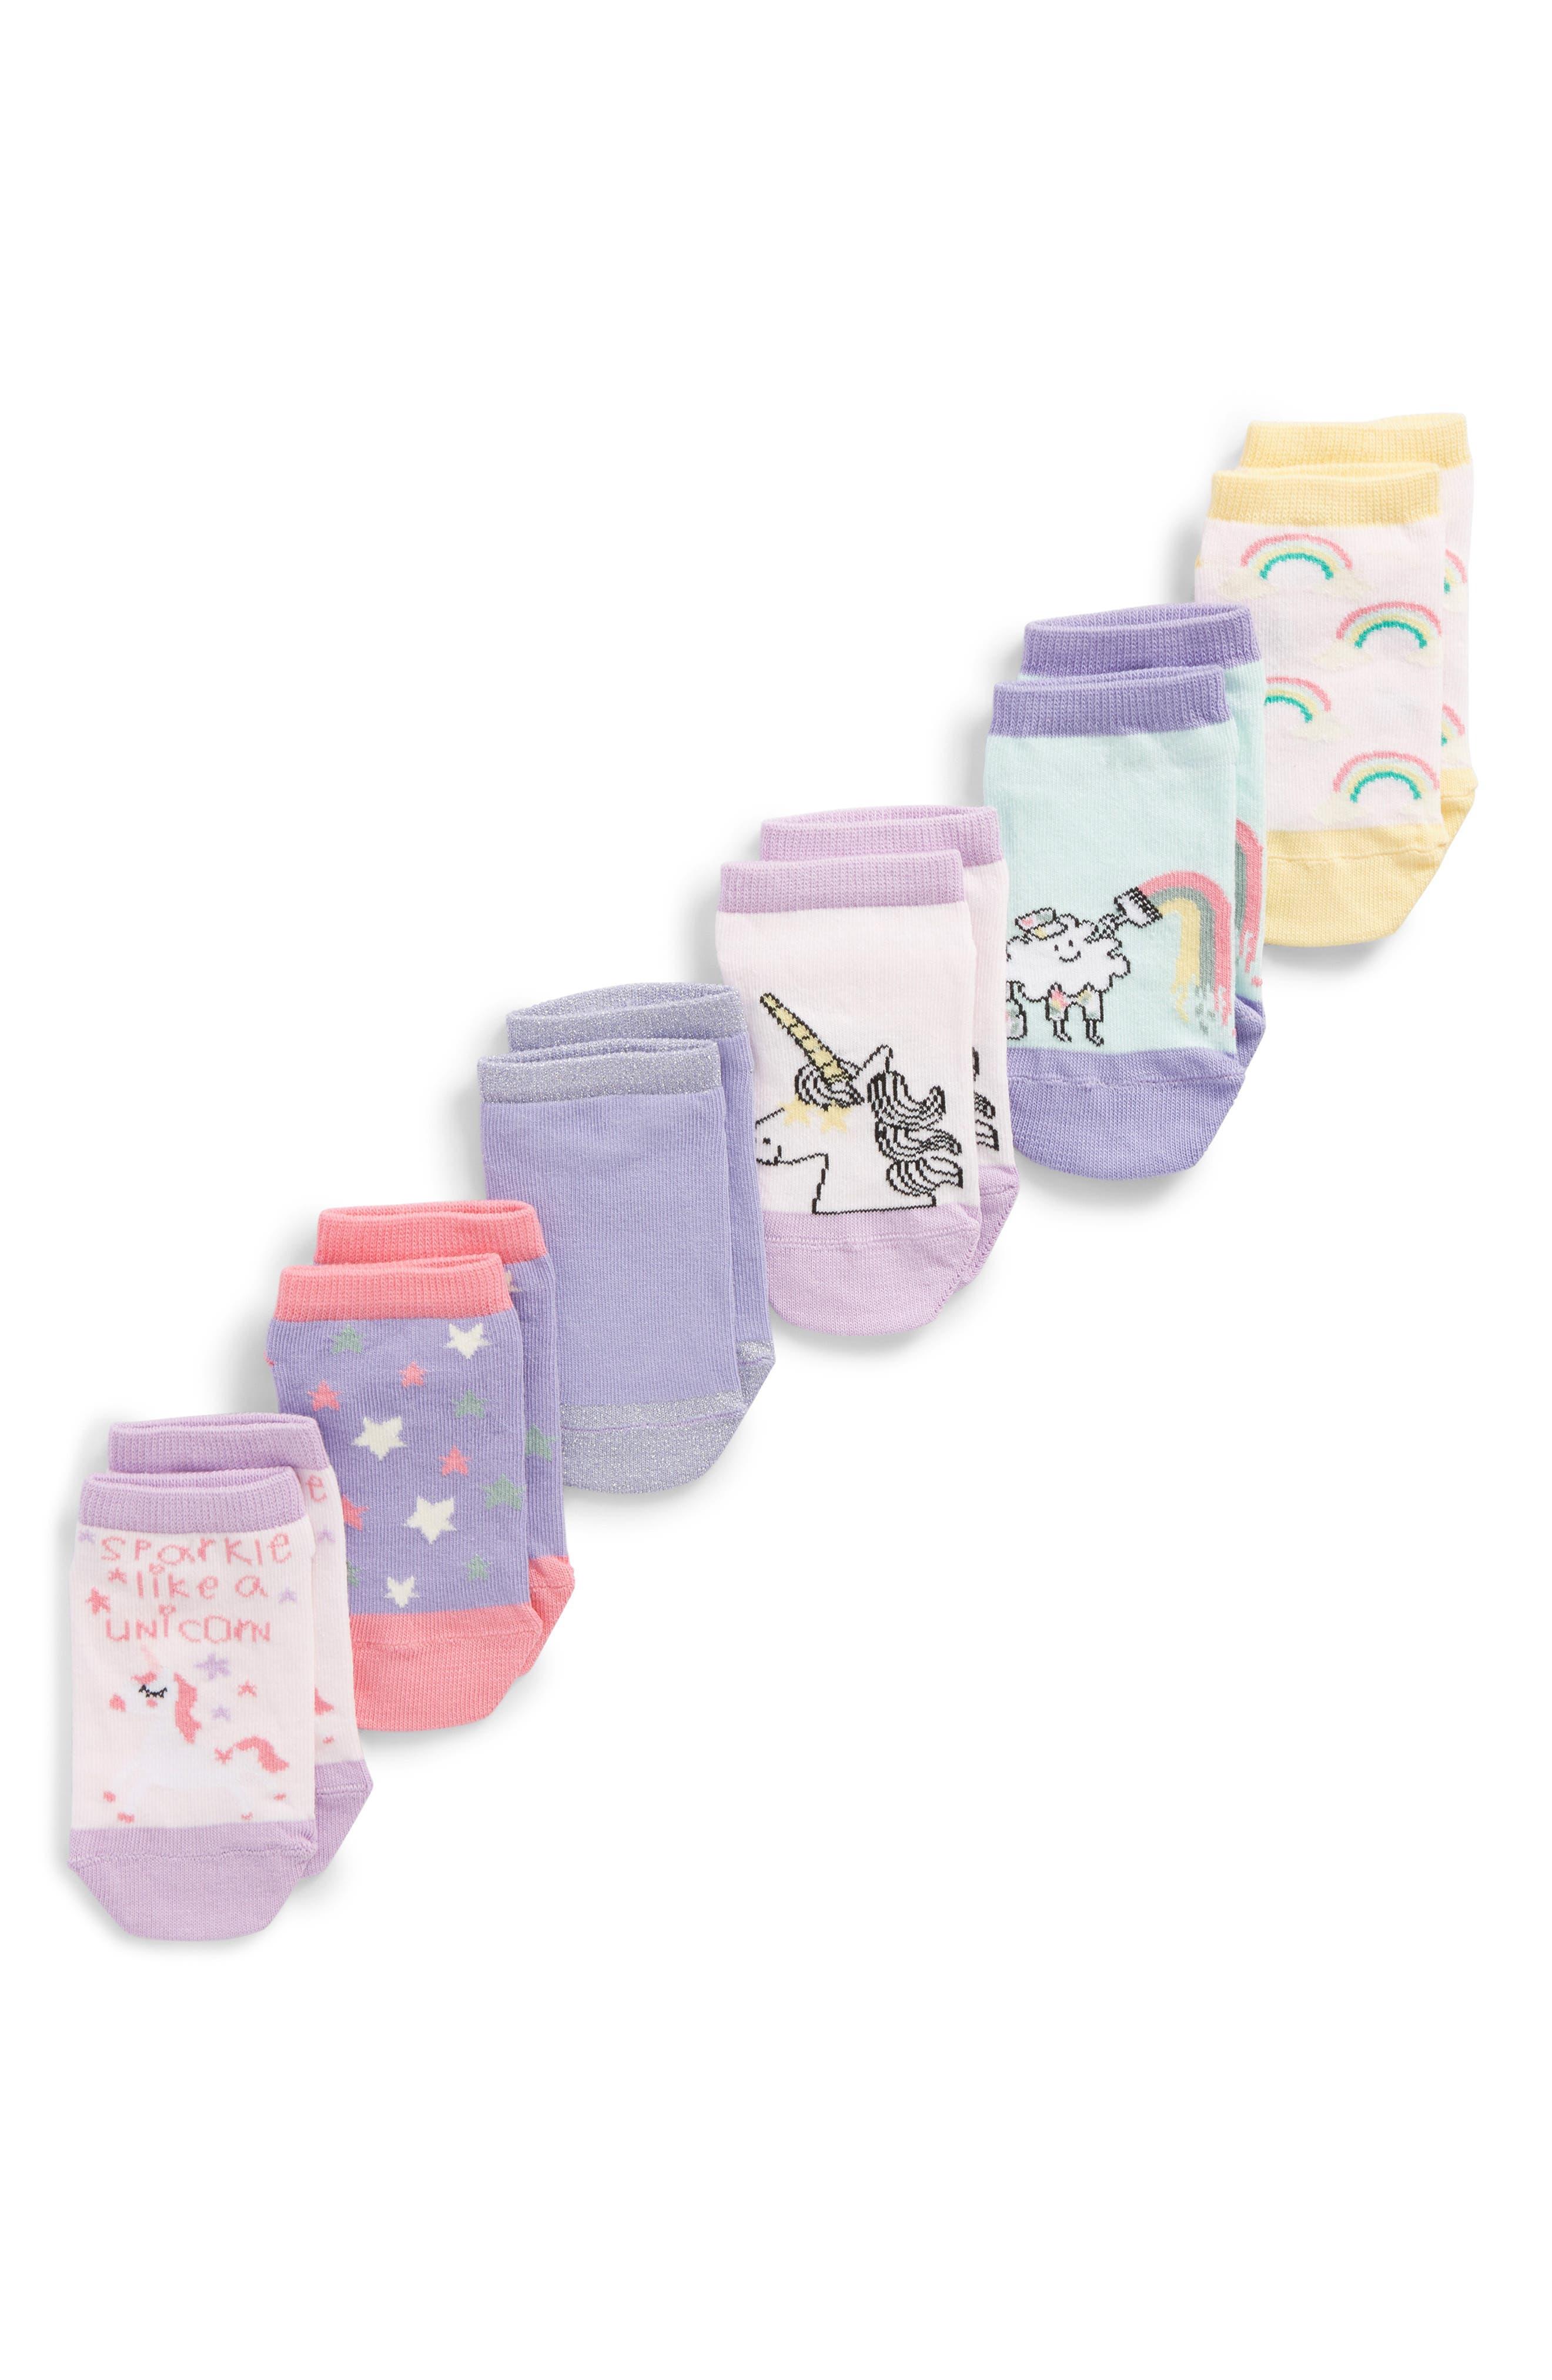 6-Pack Assorted Low Cut Socks,                         Main,                         color, Grey/Purple Multi